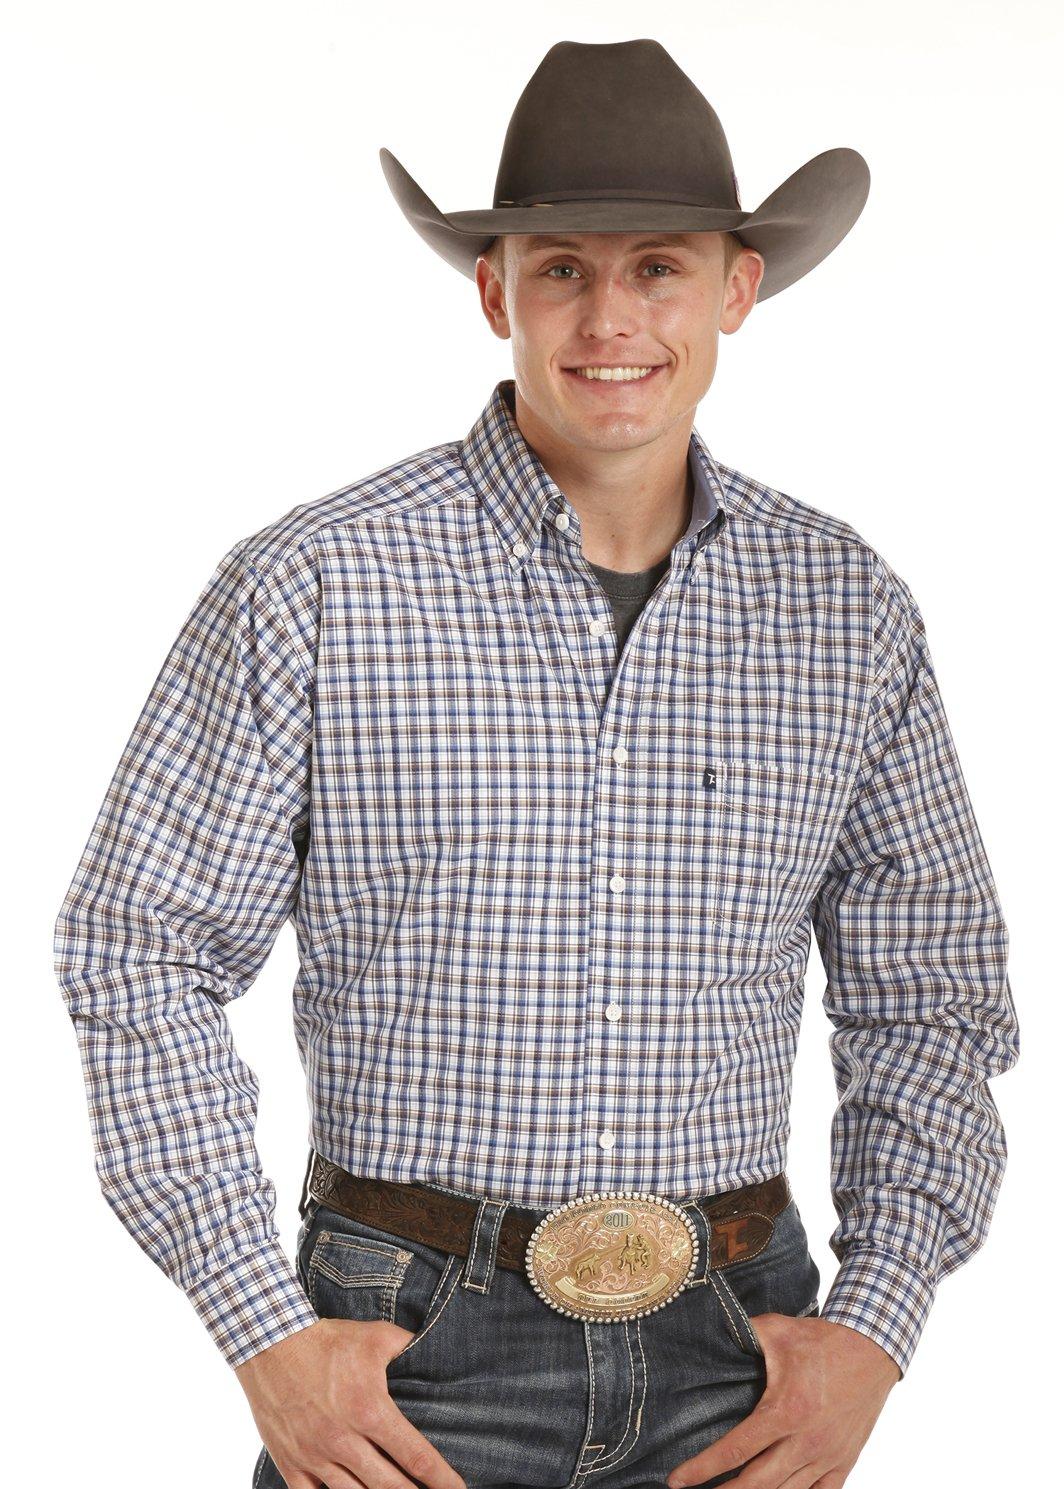 70e33e8ff Manufacturer: Panhandle Slim Style#: TCD4666 Description: Saddle up ...